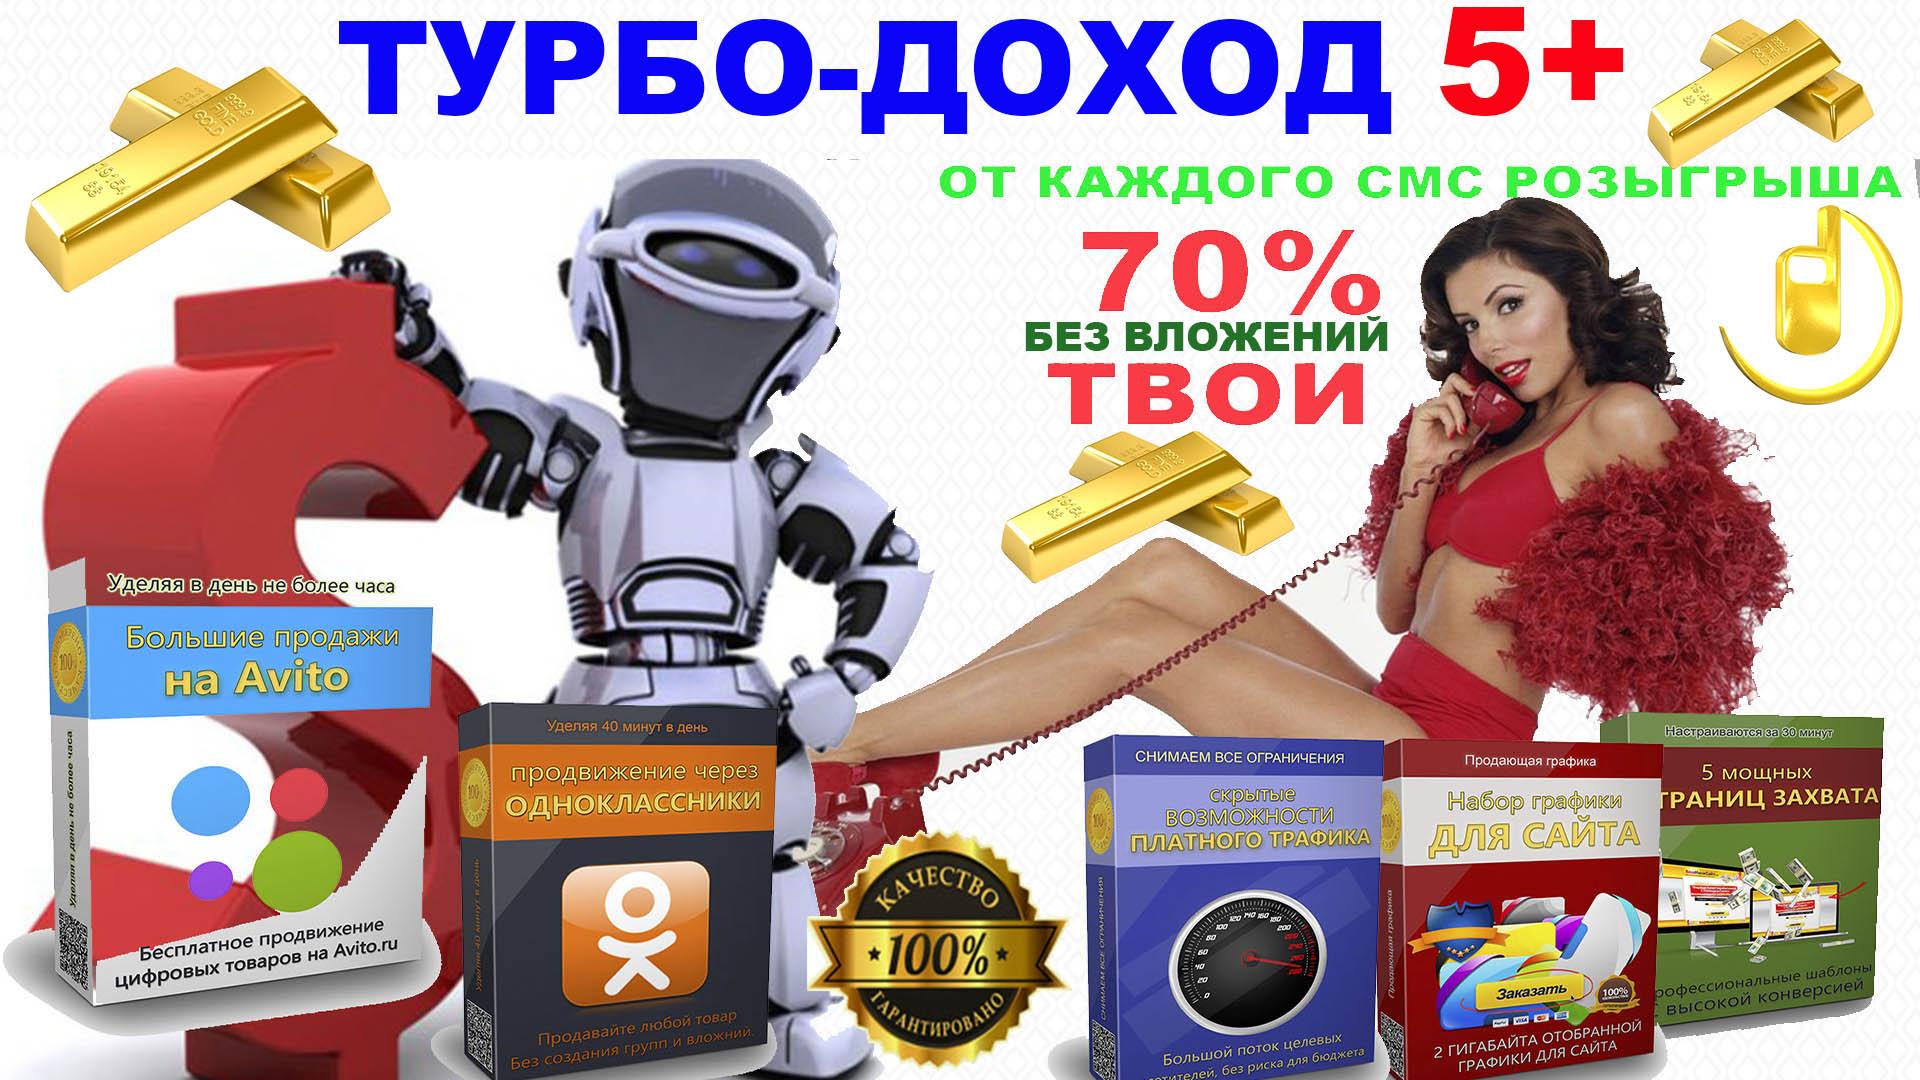 http://u4.platformalp.ru/4b98e90ba839623e88d5b3d6dce56562/2a516136a26d2f8d7ed864c7c5a7b9fe.jpg